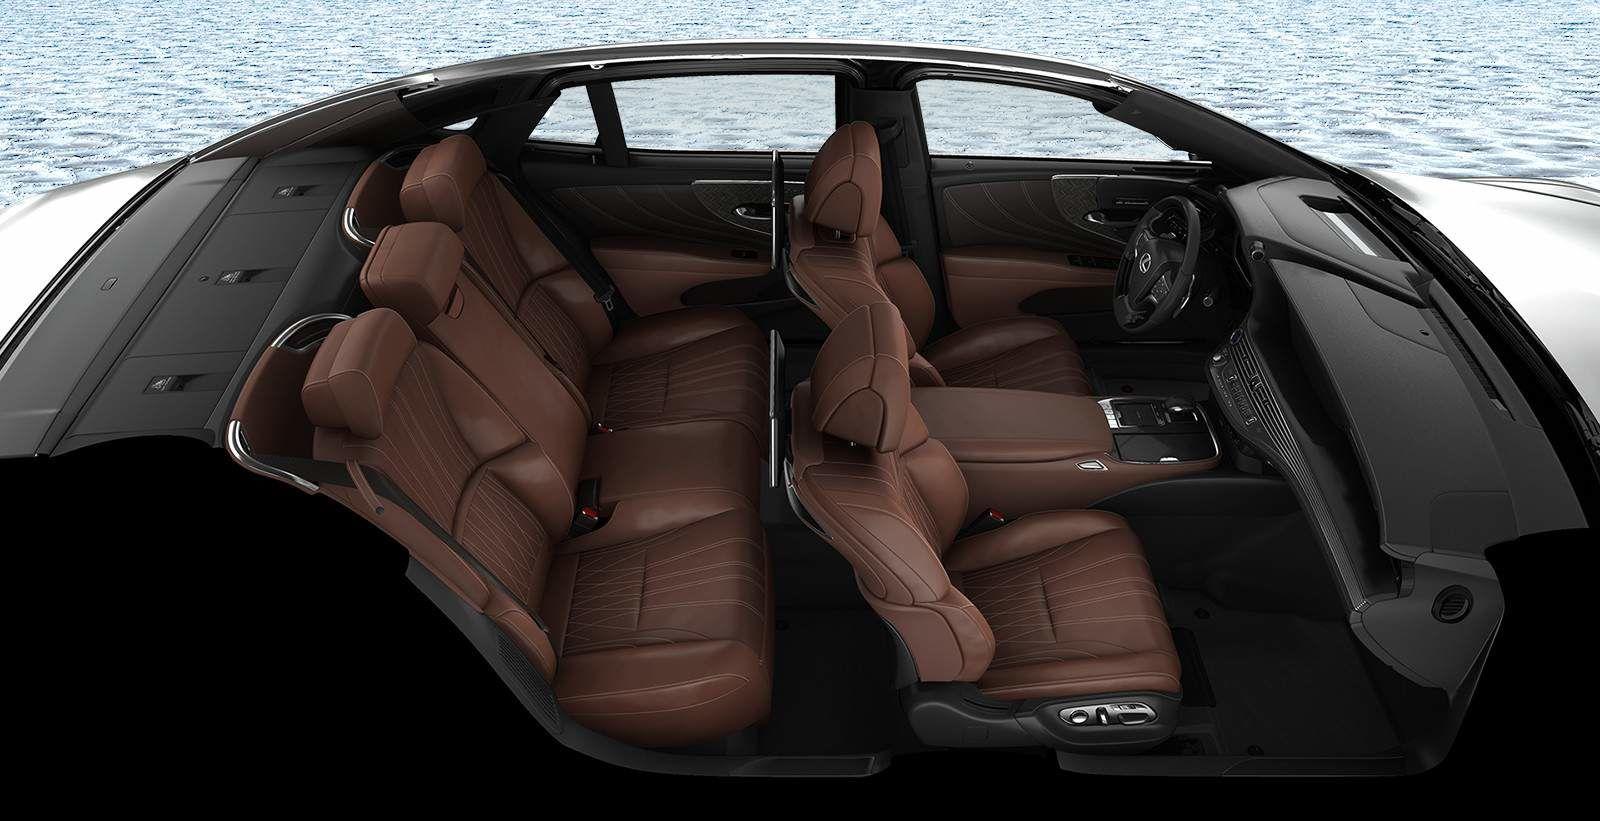 2020 Lexus LS Interior at Ken Shaw Lexus in Toronto